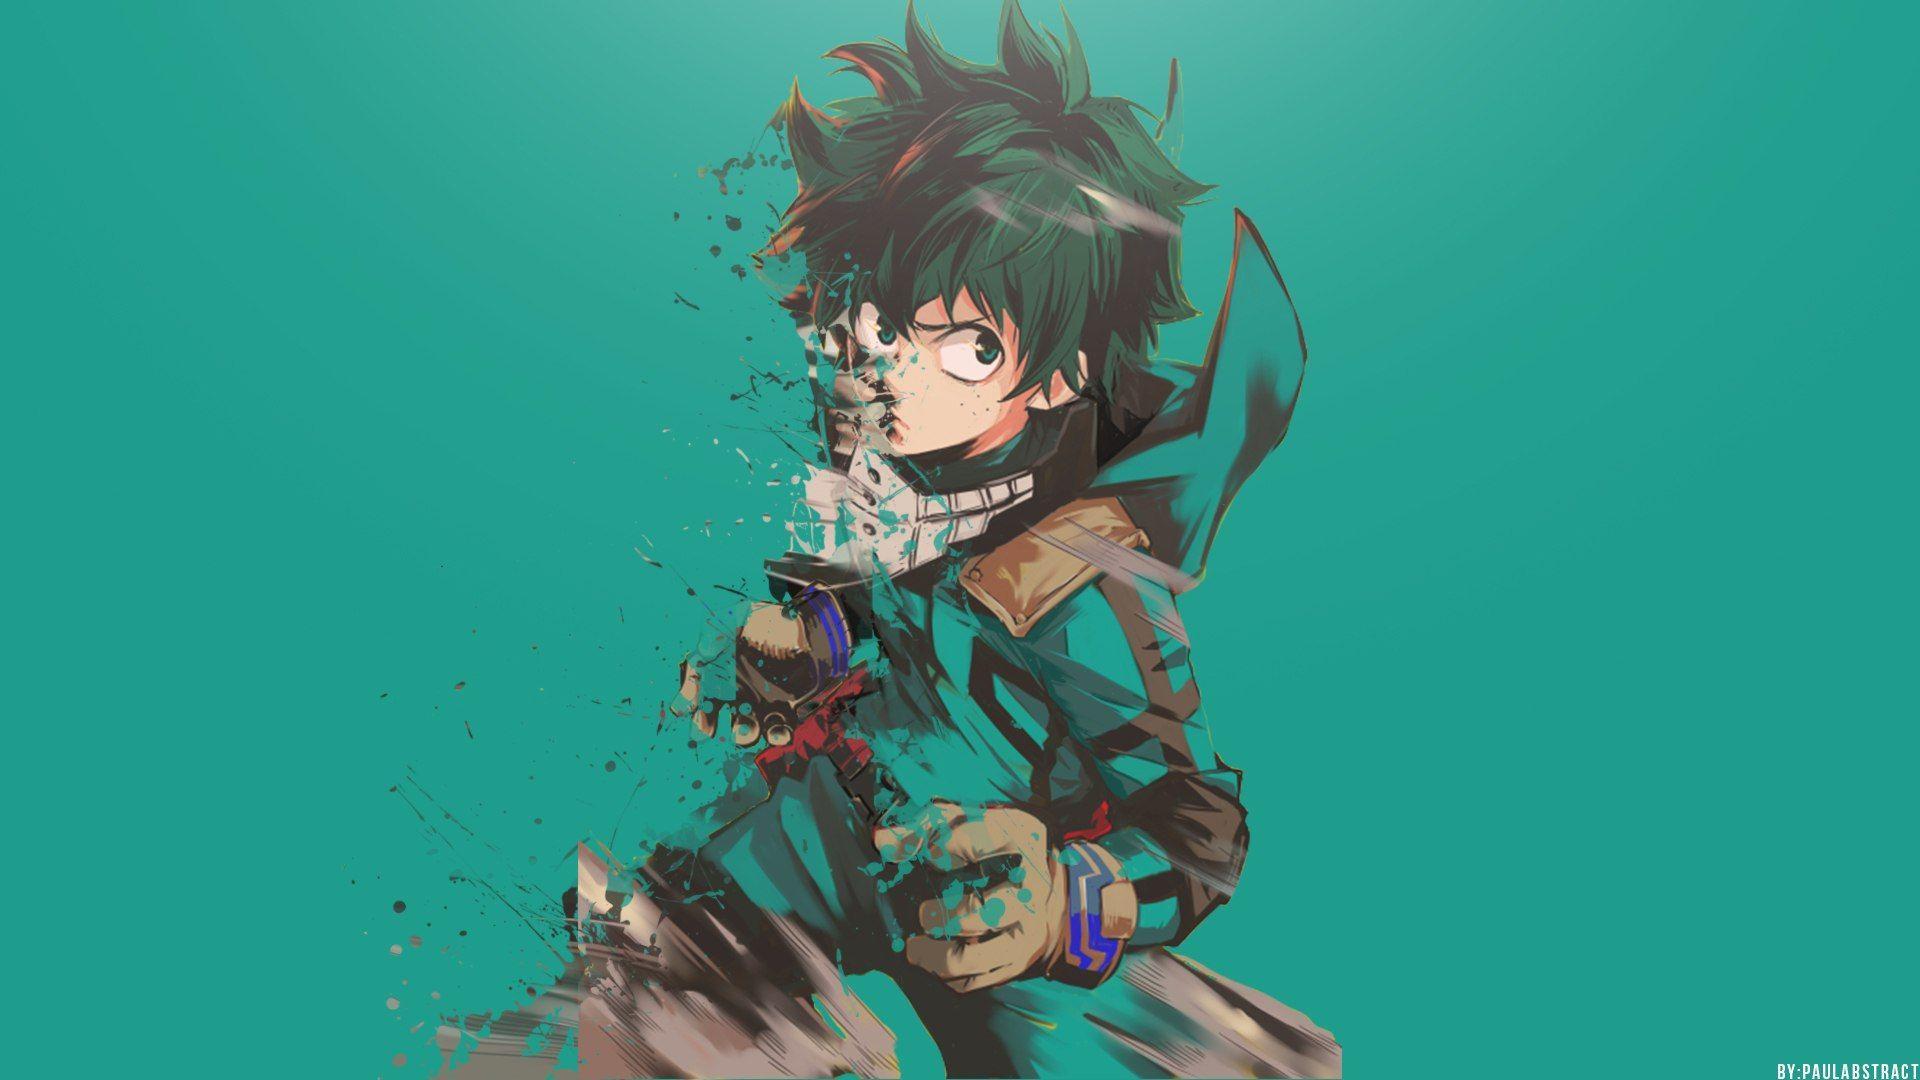 Deku My Hero Academia 4k Wallpapers Top Free Deku My Hero